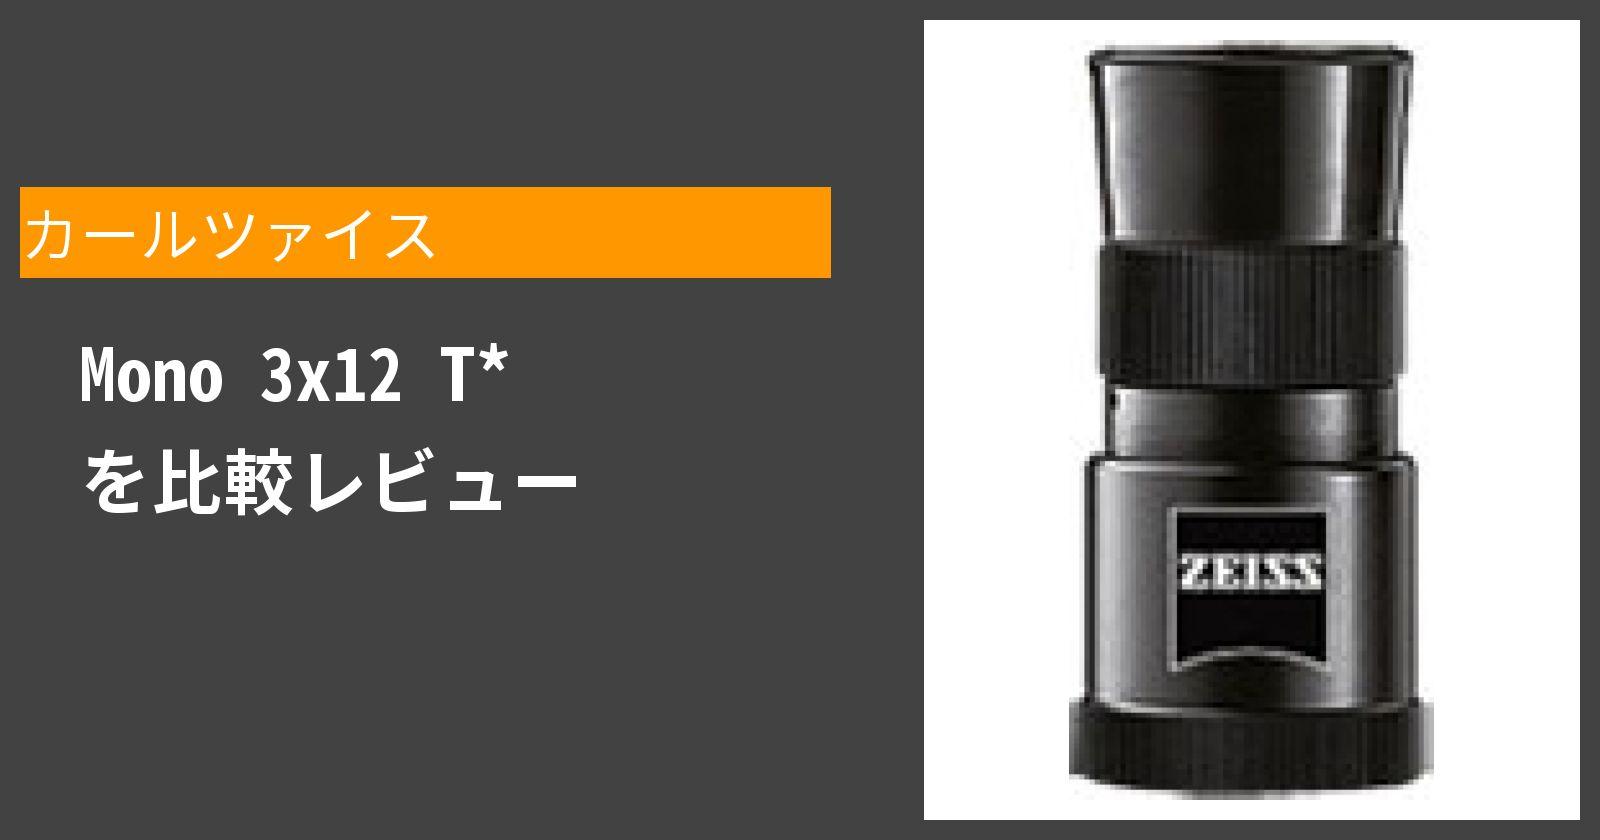 Mono 3x12 T*を徹底評価